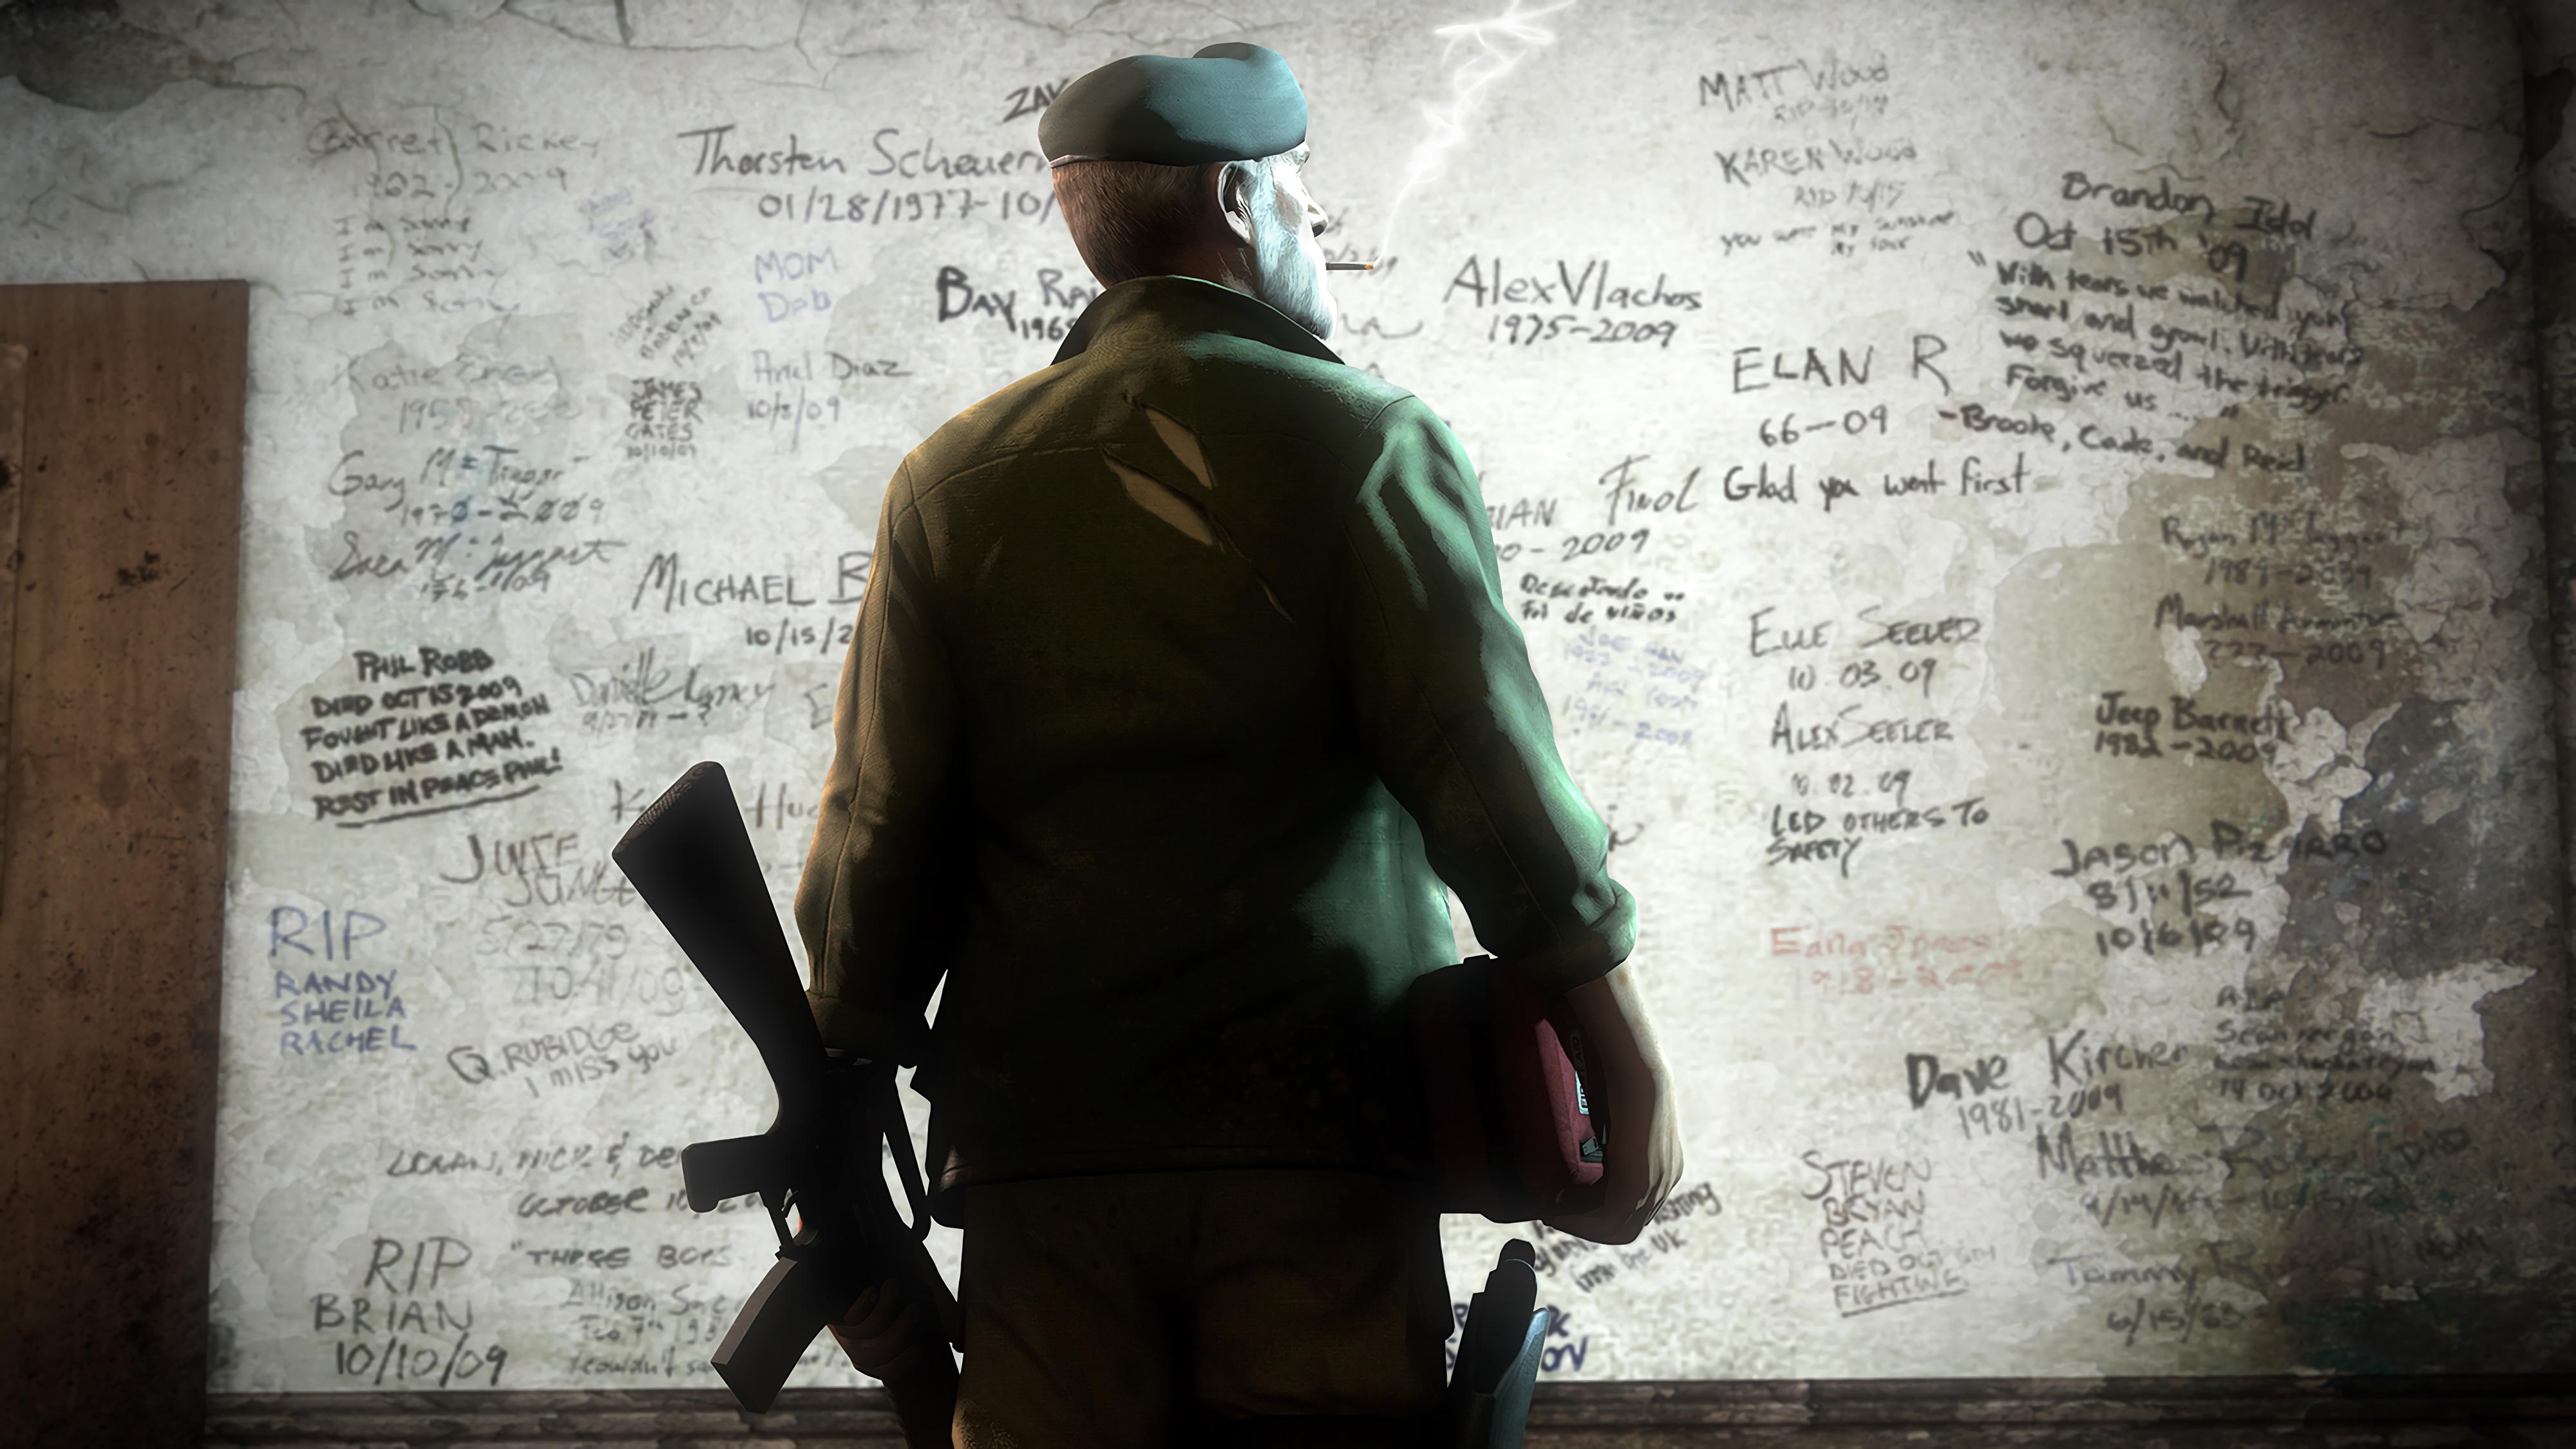 Left 4 Dead 4k Hd Games 4k Wallpapers Images Backgrounds